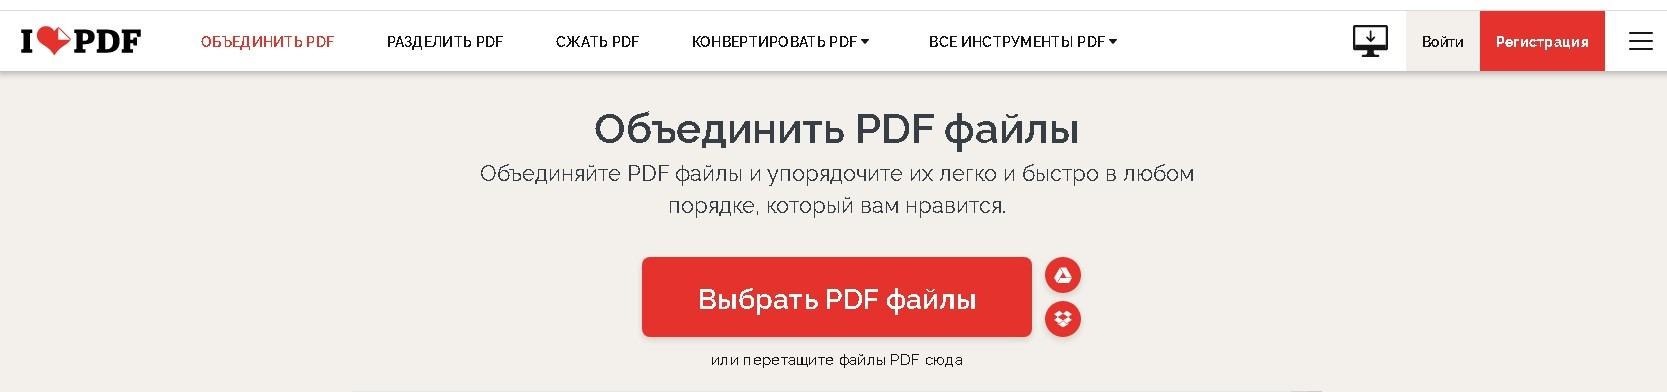 ilovepdf.com